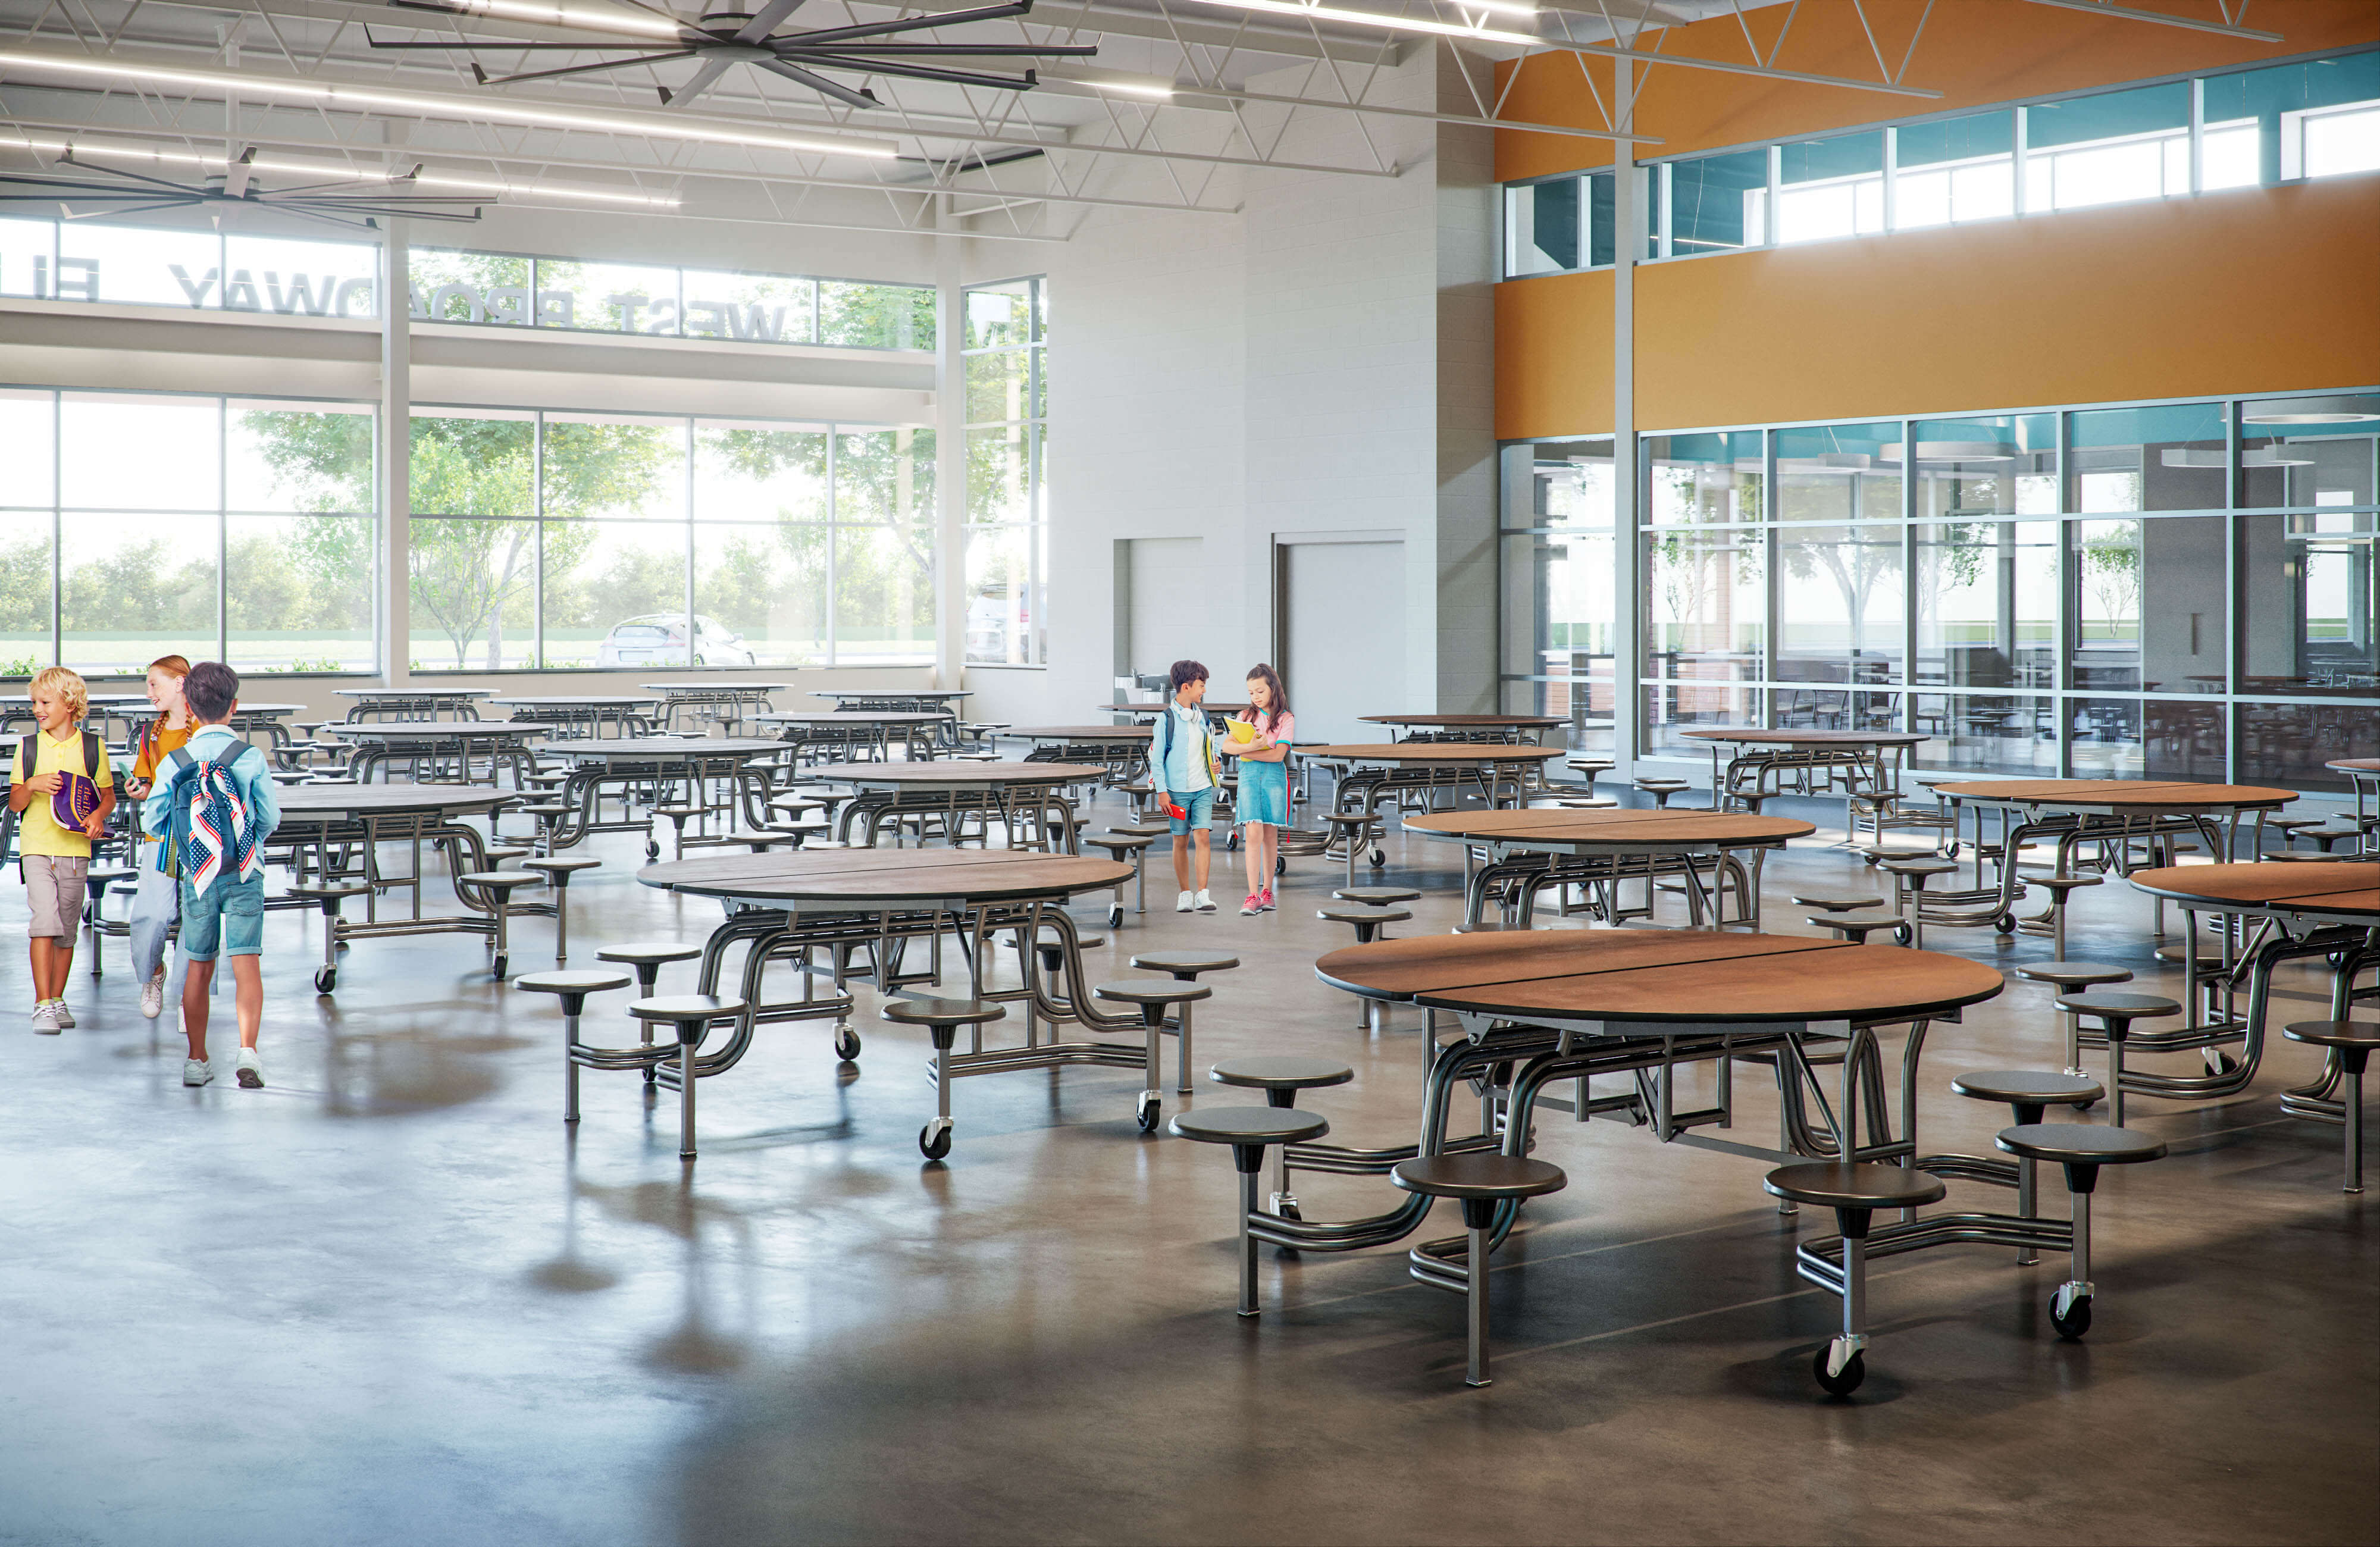 JCPS-WestBroadwayElementarySchool-cafeteria